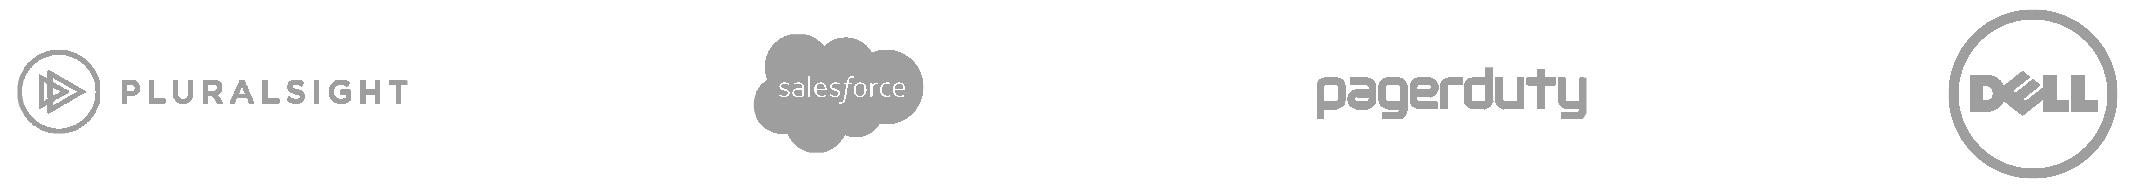 Client Logos: Wrike, Avalara, skillsoft, Fleetmatics